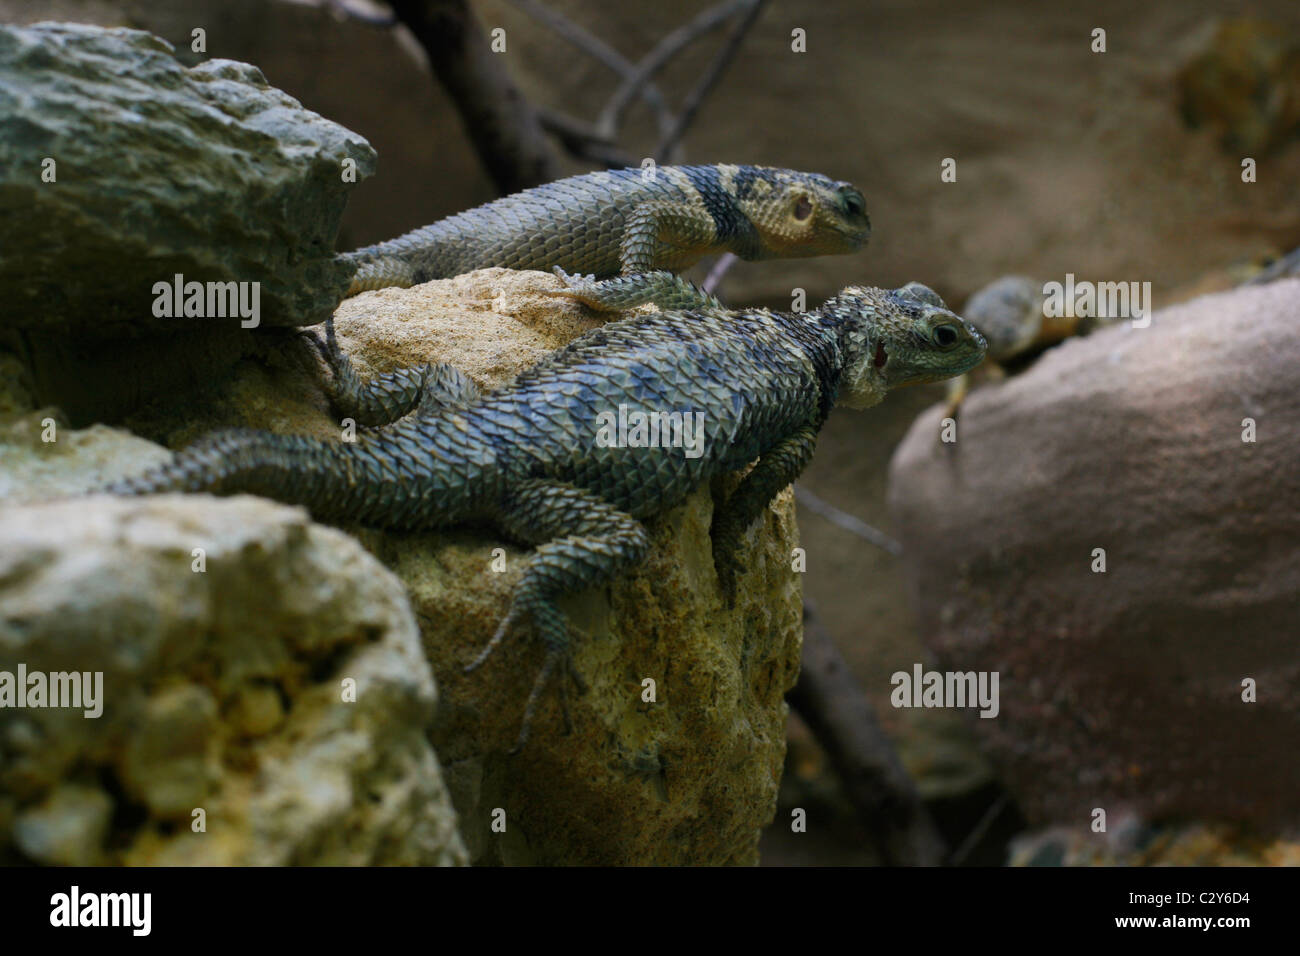 Blue Spiny Lizards Sceloporus Cyanogenys Cope - Stock Image